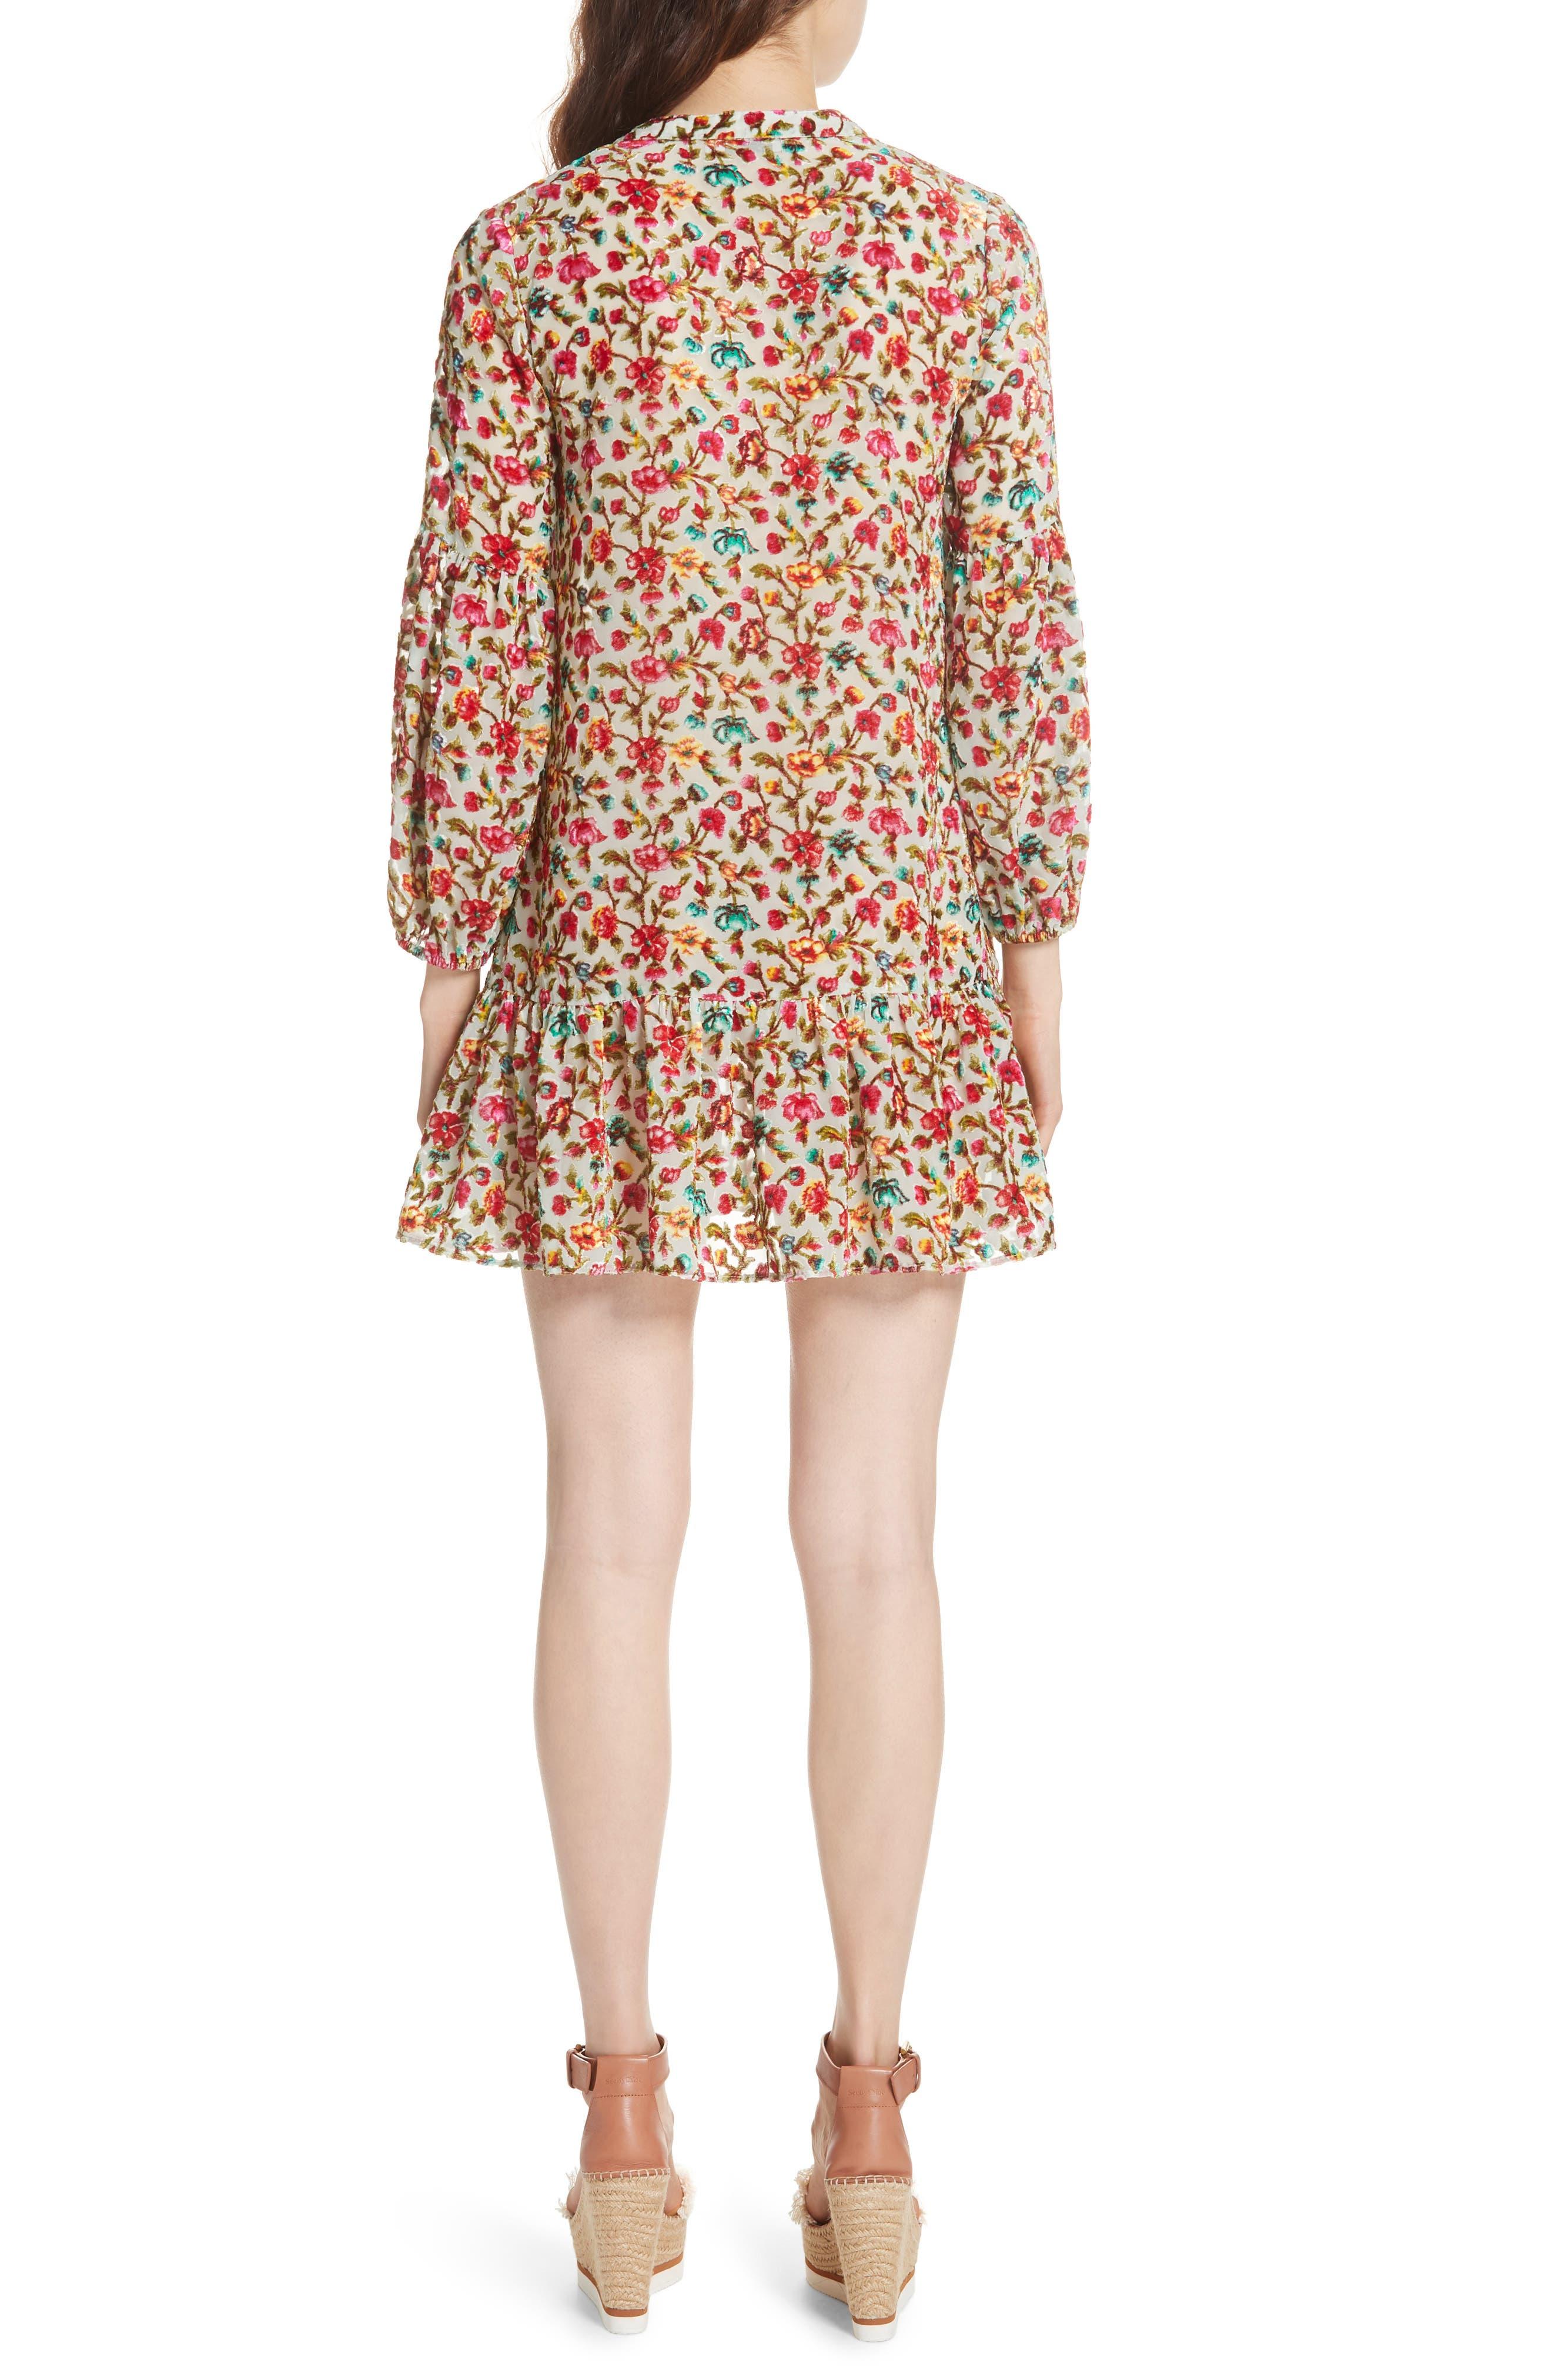 Simpson Printed Dress,                             Alternate thumbnail 2, color,                             693